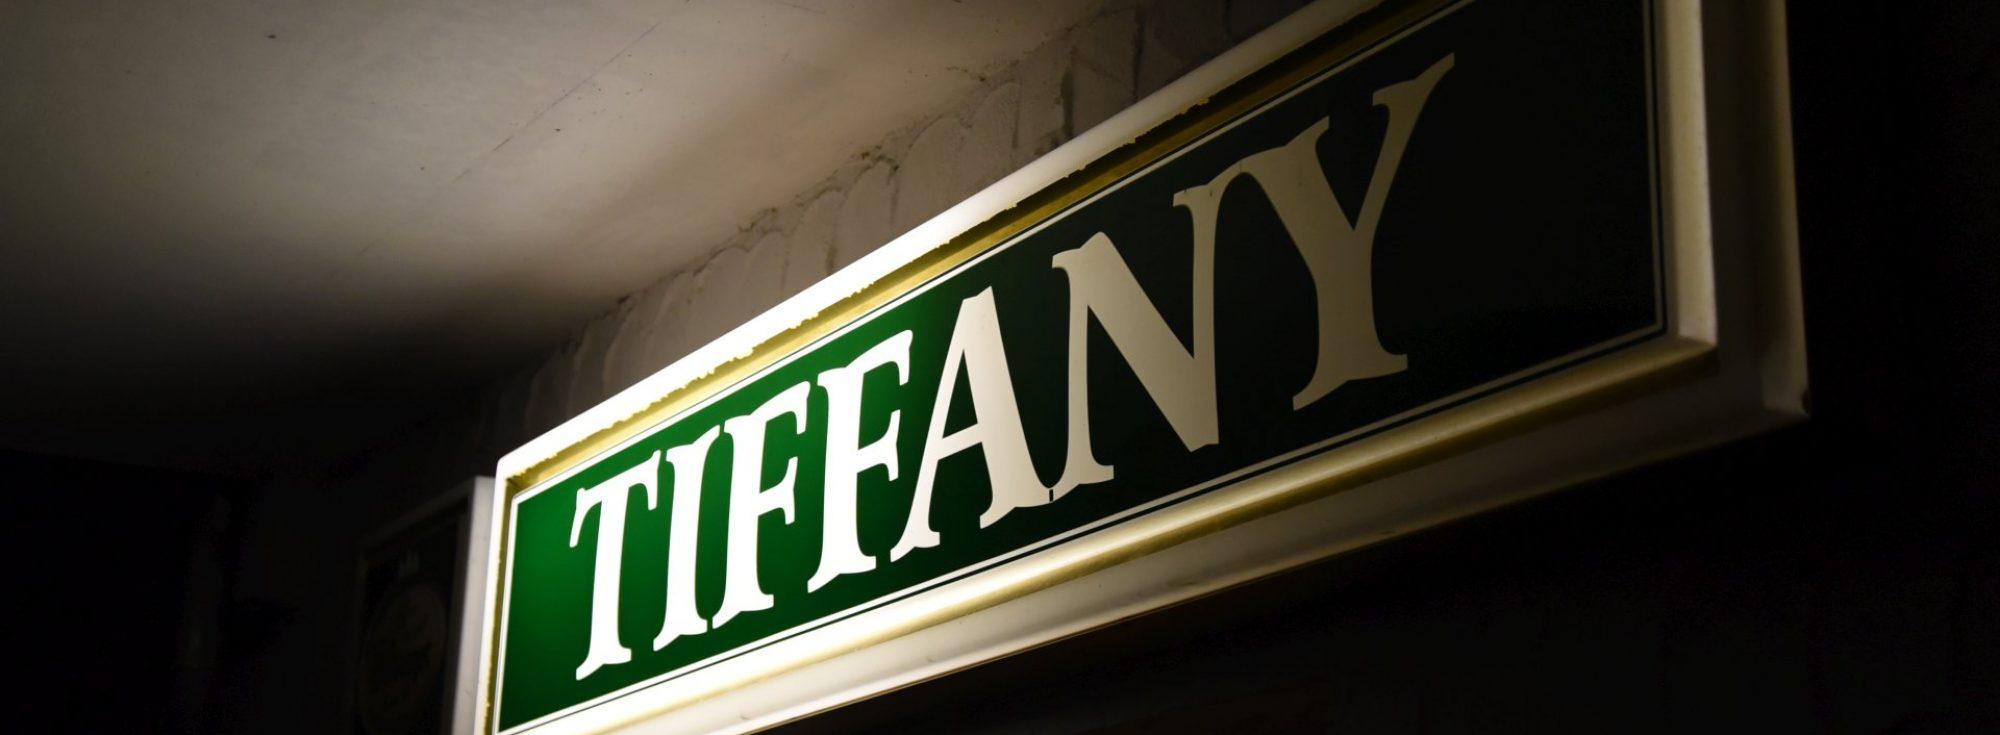 Discothek Tiffany